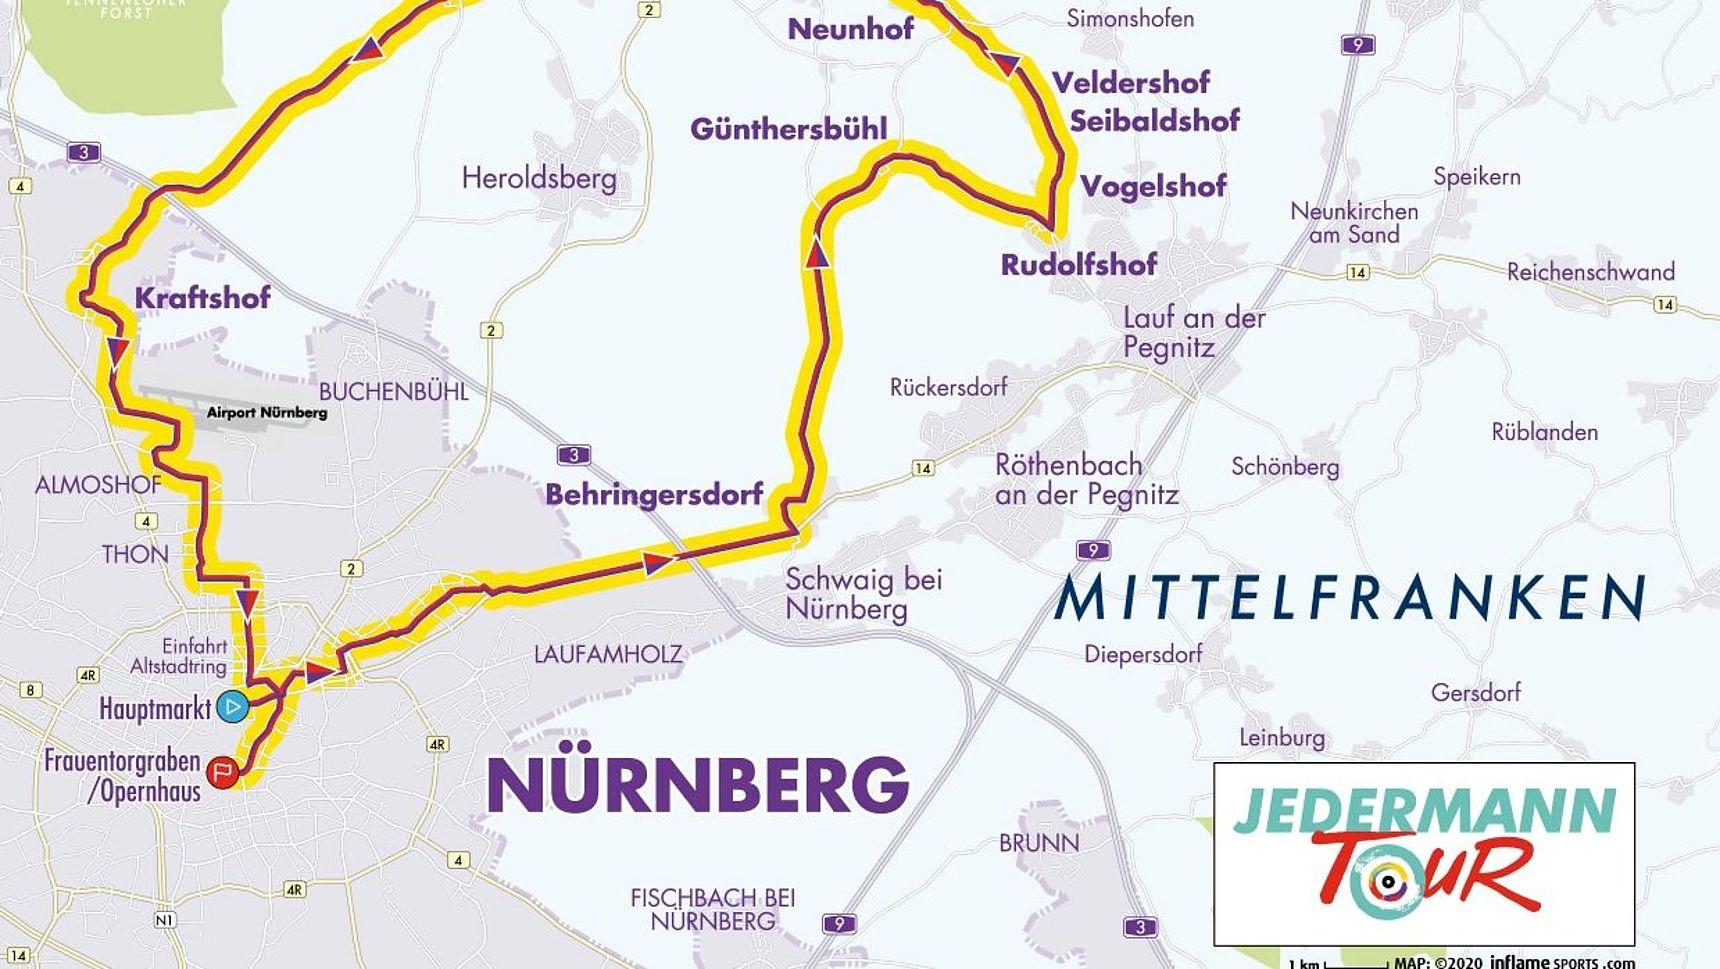 Streckenkarte Jedermann Tour 2021.